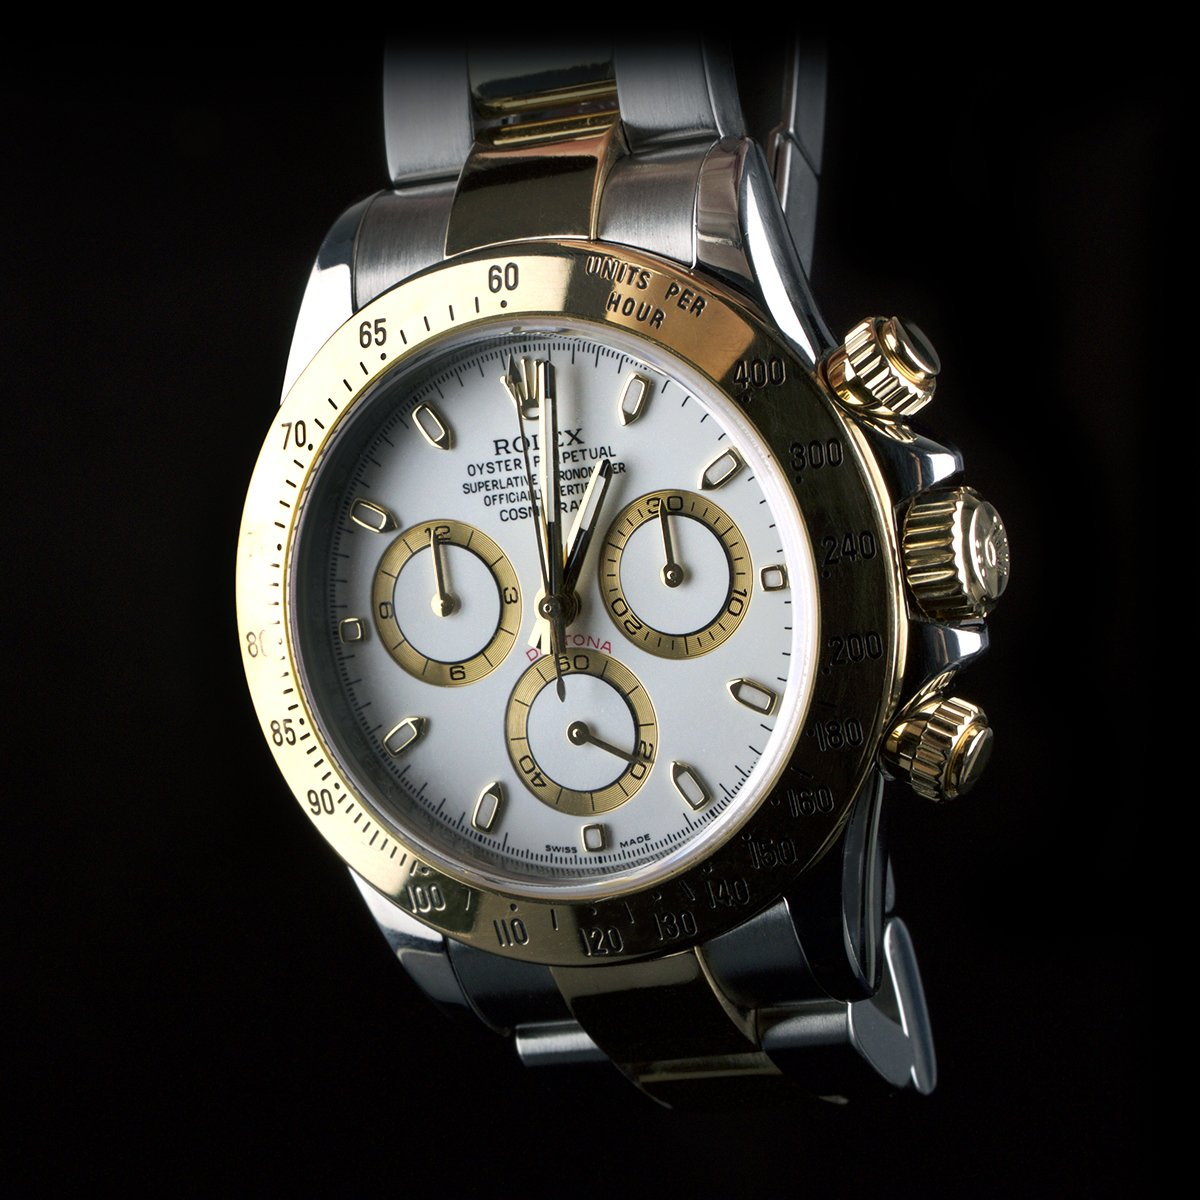 Photo of watch Rolex Daytona ref 116523 gold steel white dial